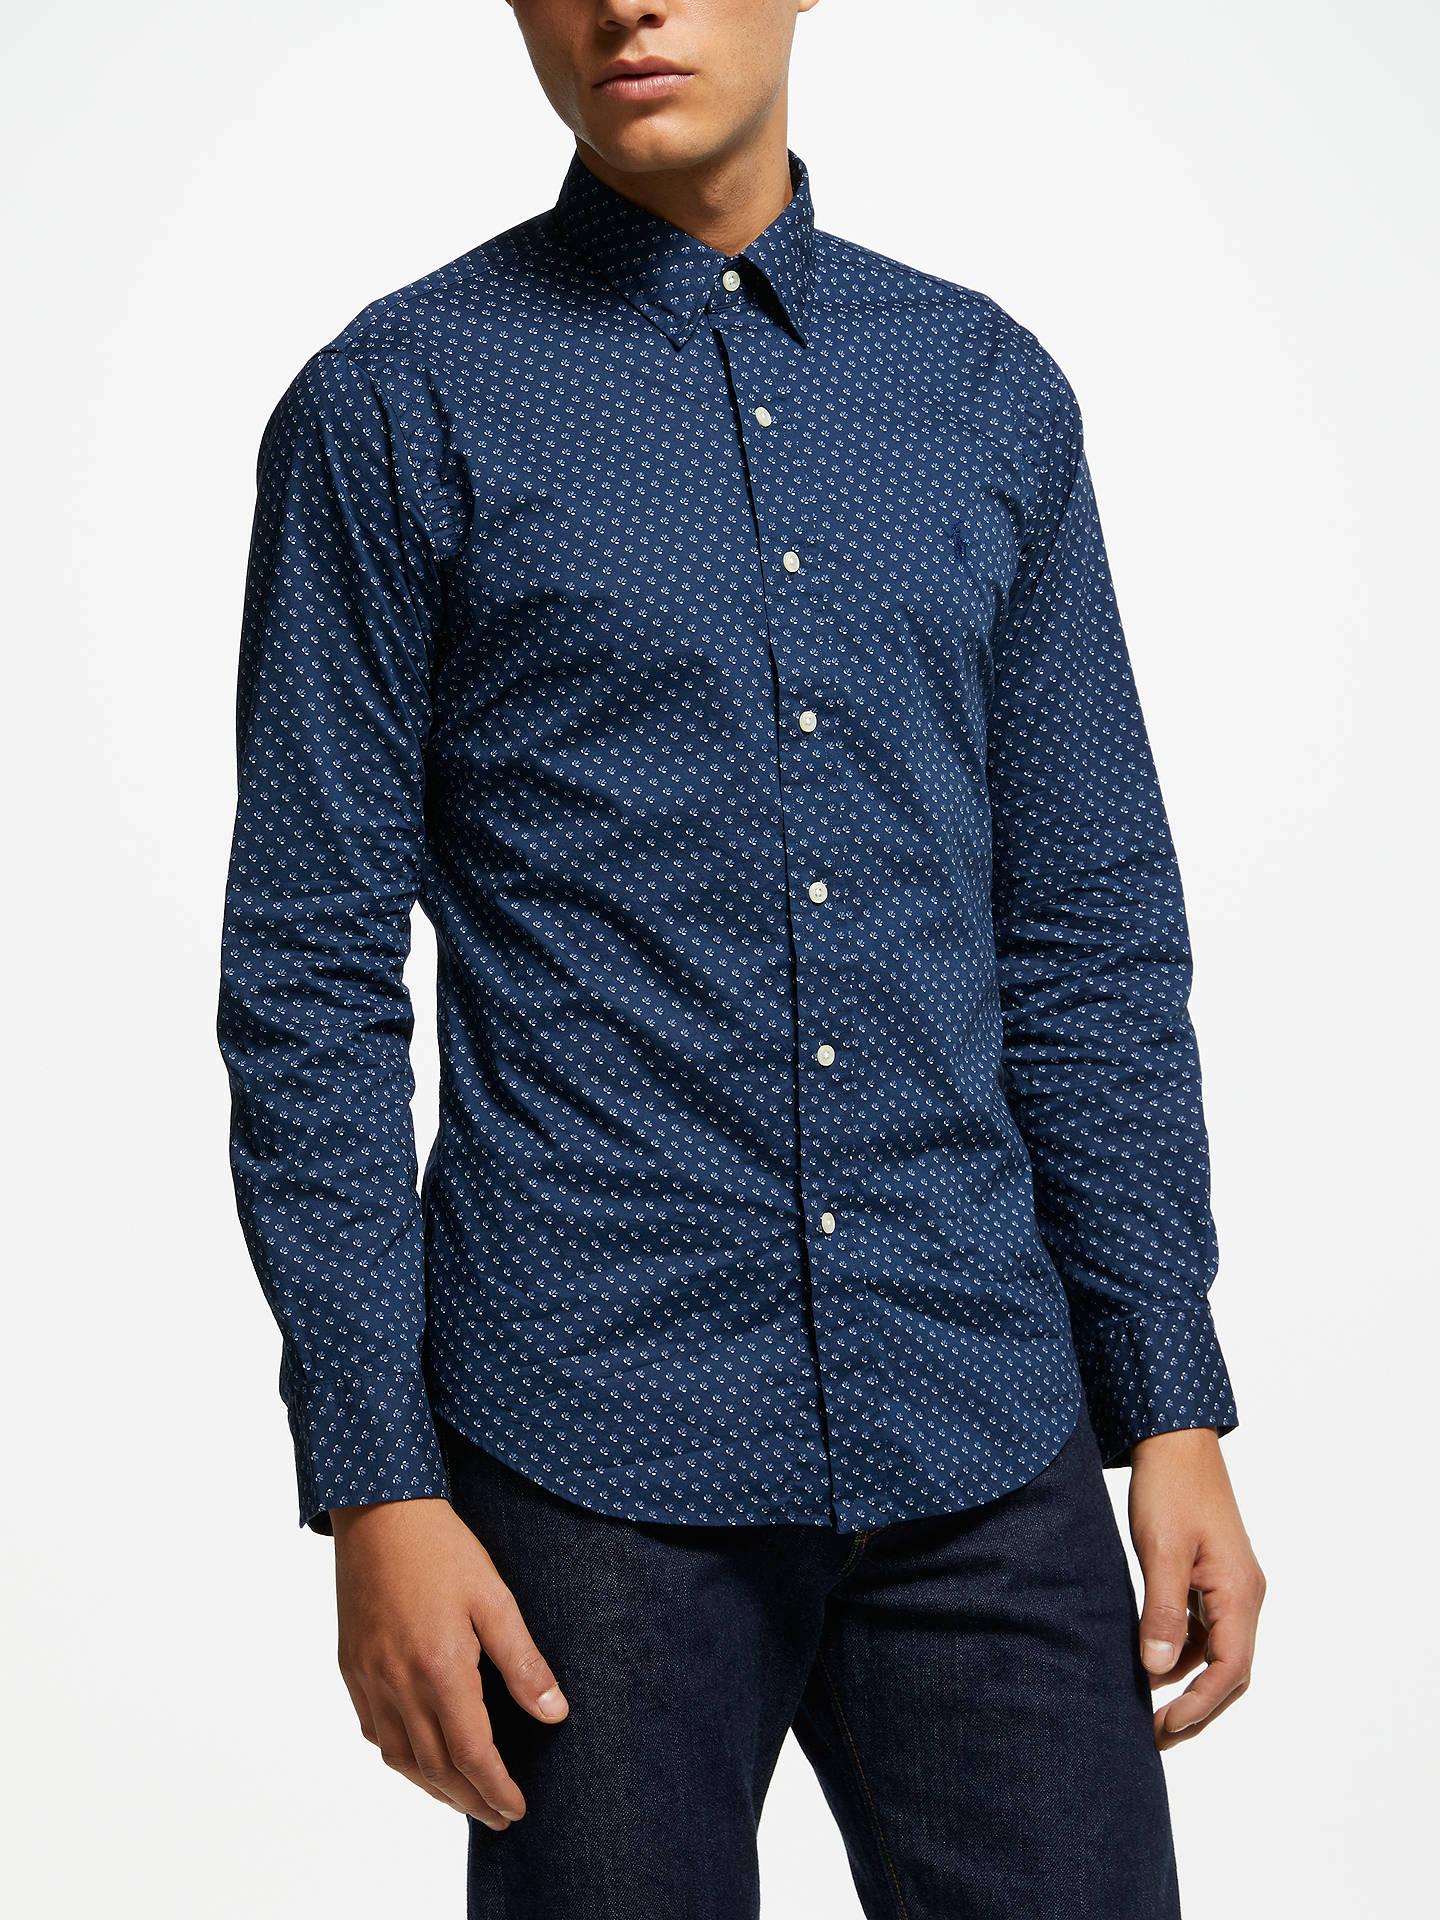 8dd326ce090dc Buy Polo Ralph Lauren Slim Fit Sport Shirt